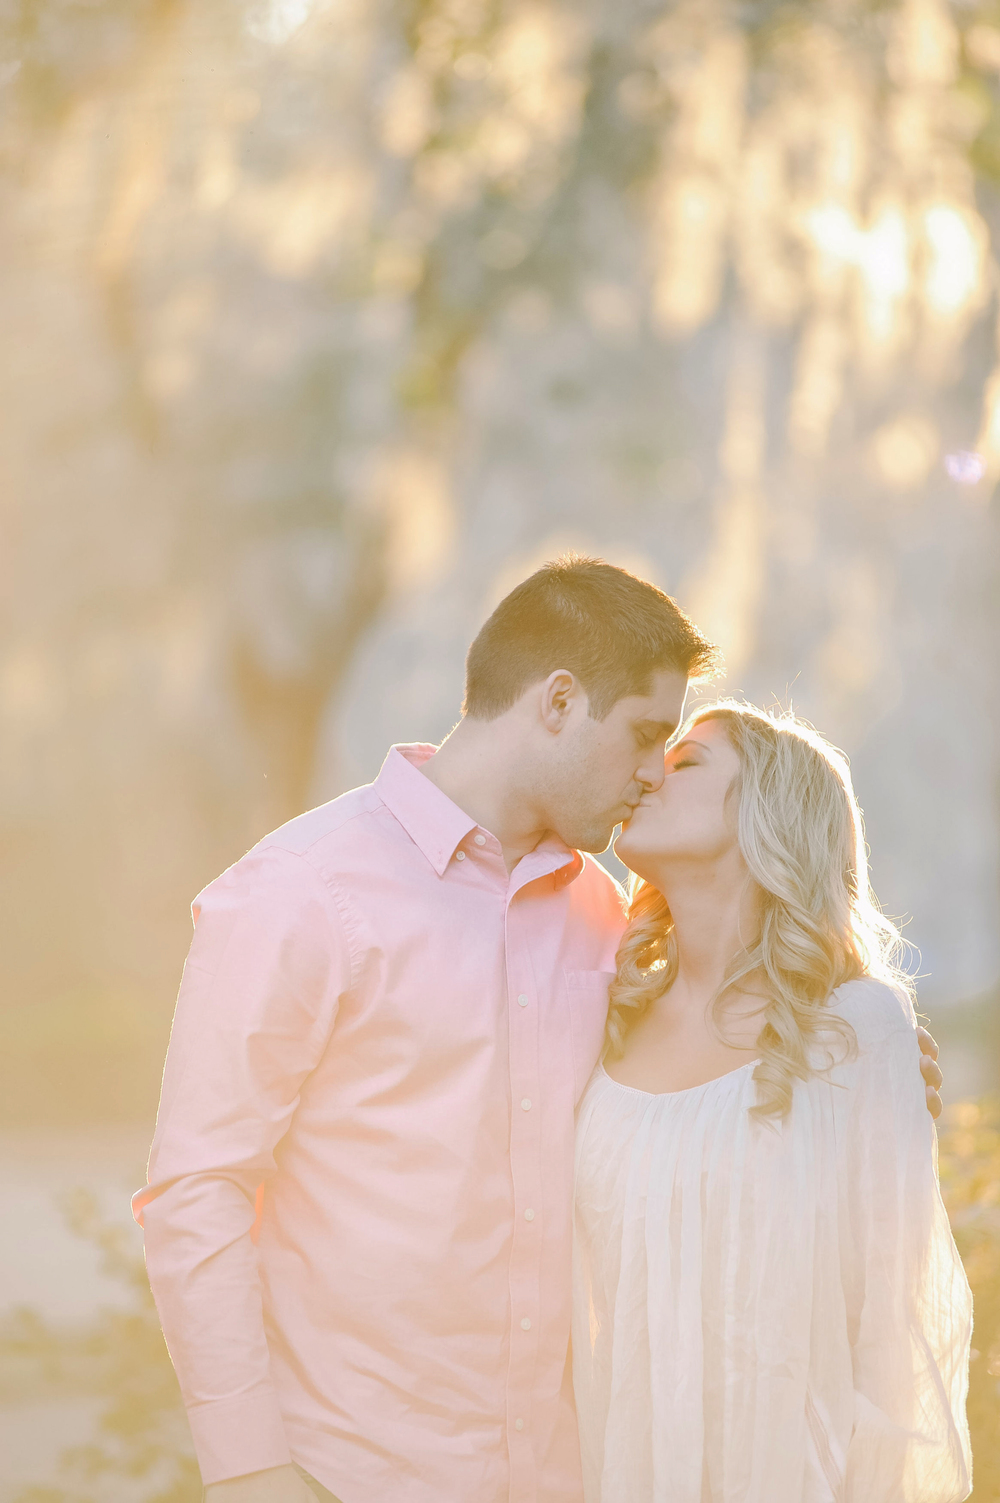 Charleston engagement photographer captures couple under Spanish moss in Charleston, SC at sunset.